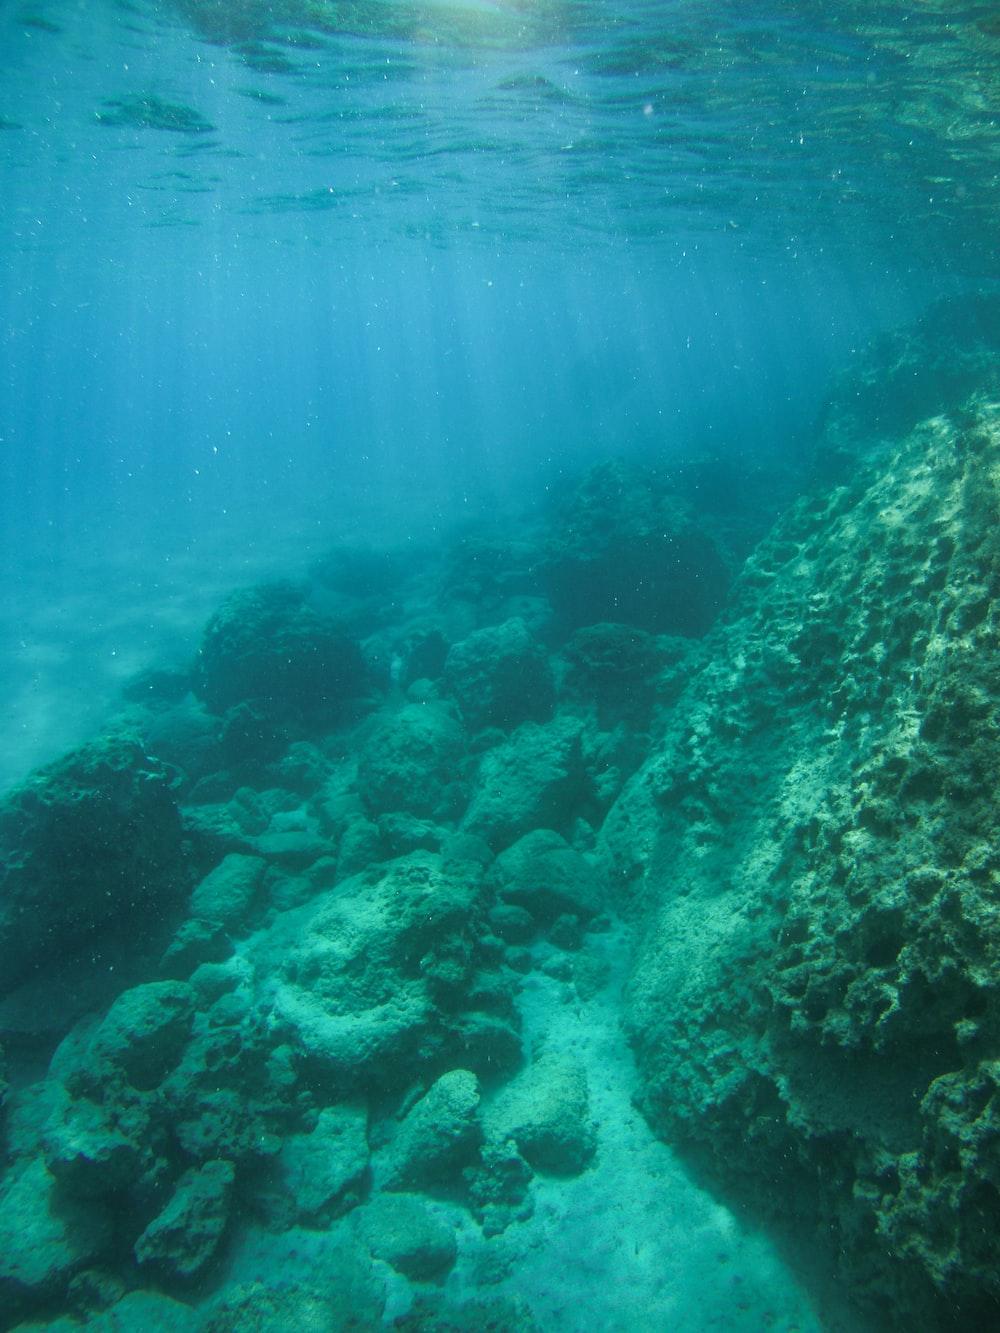 underwater photography of rocks